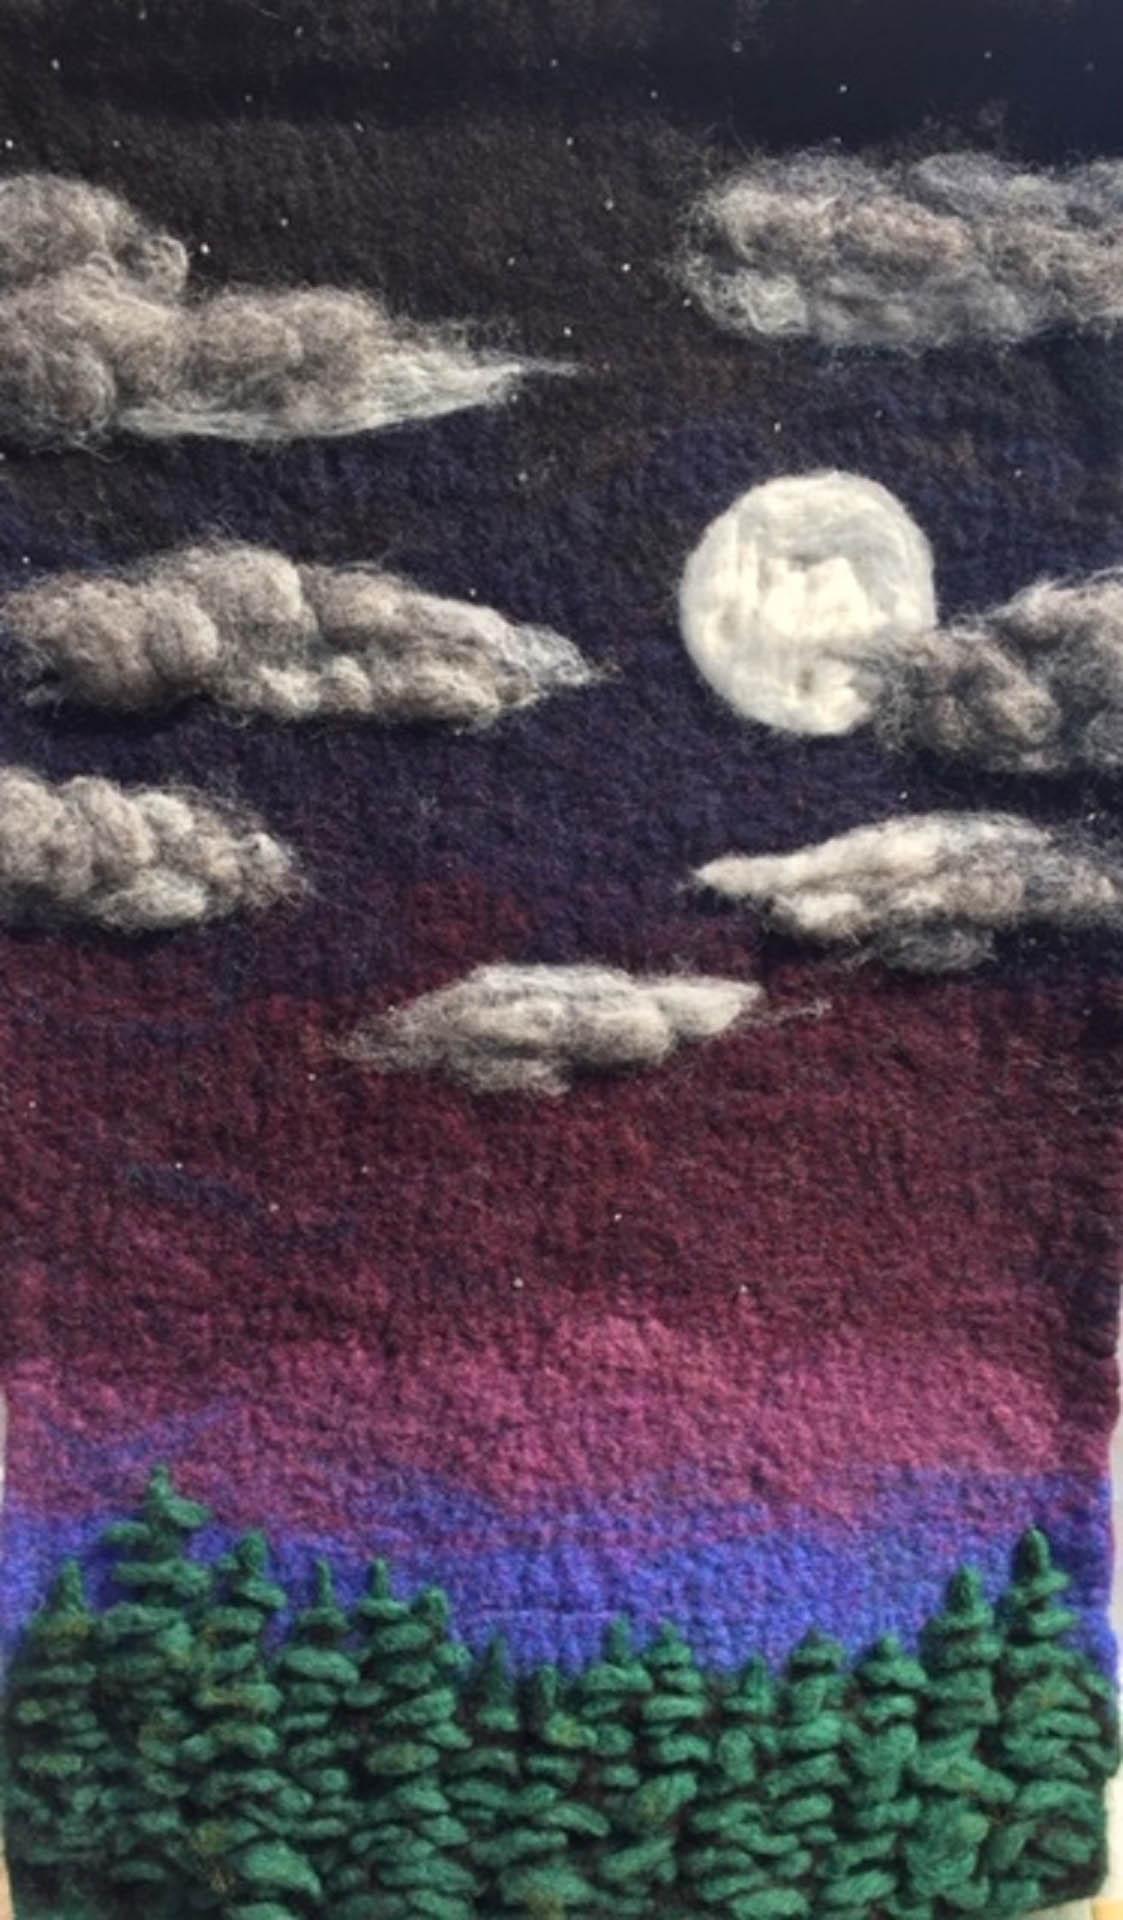 terry-kloiber-full-moon